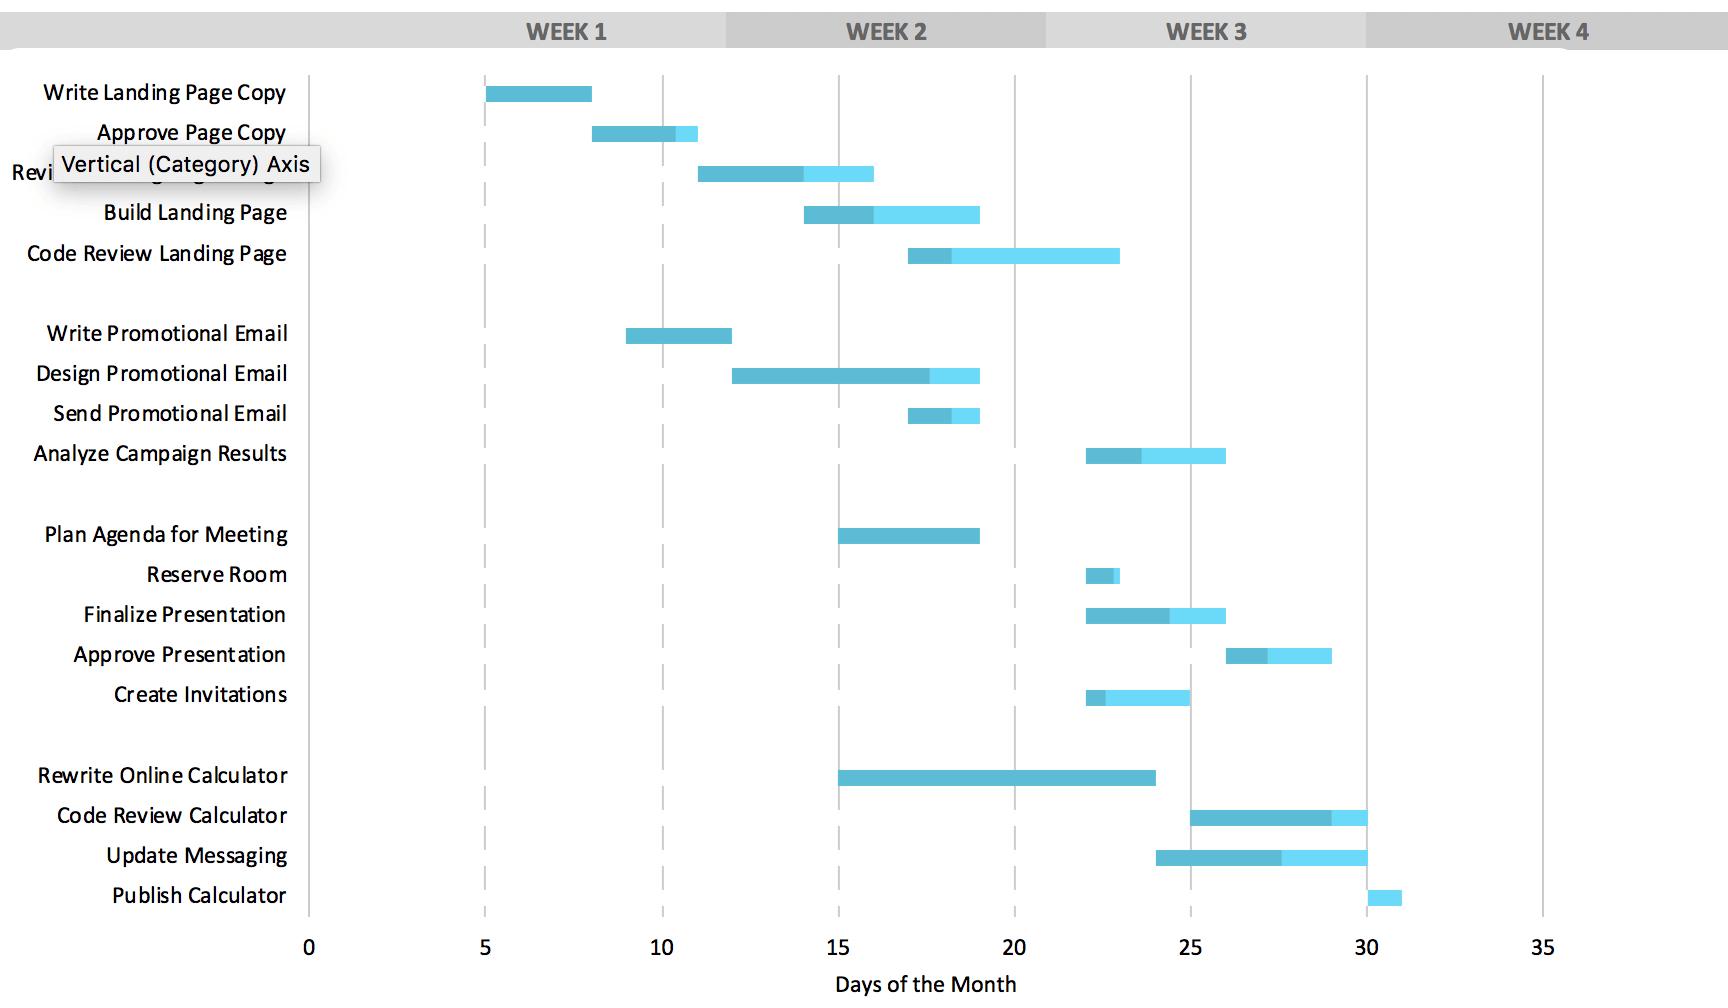 Excel Spreadsheet Gantt Chart Intended For Free Gantt Chart Excel Template: Download Now  Teamgantt